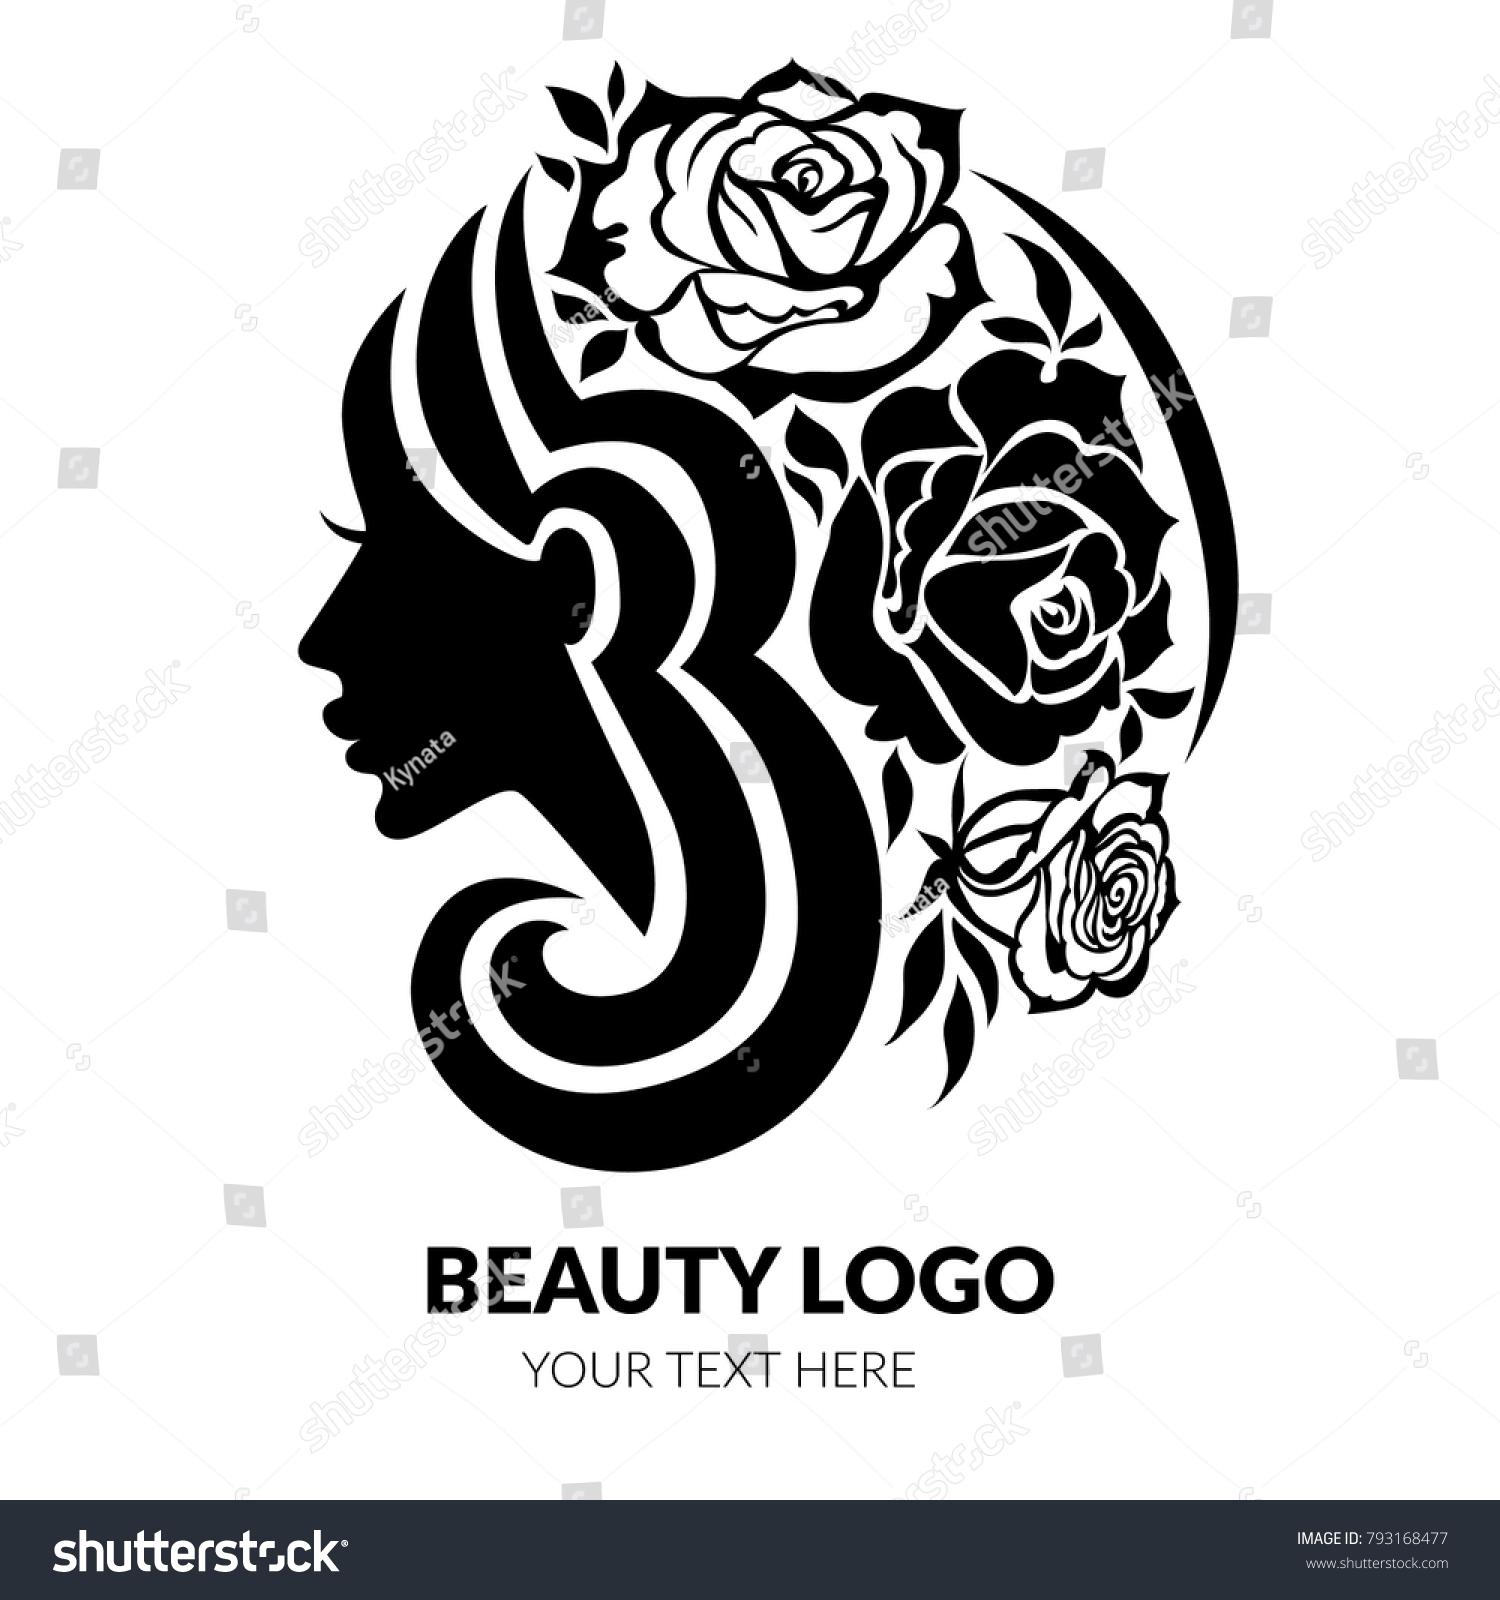 Vector illustration woman beautiful hair flowers stock vector vector illustration woman beautiful hair flowers stock vector 793168477 shutterstock izmirmasajfo Gallery